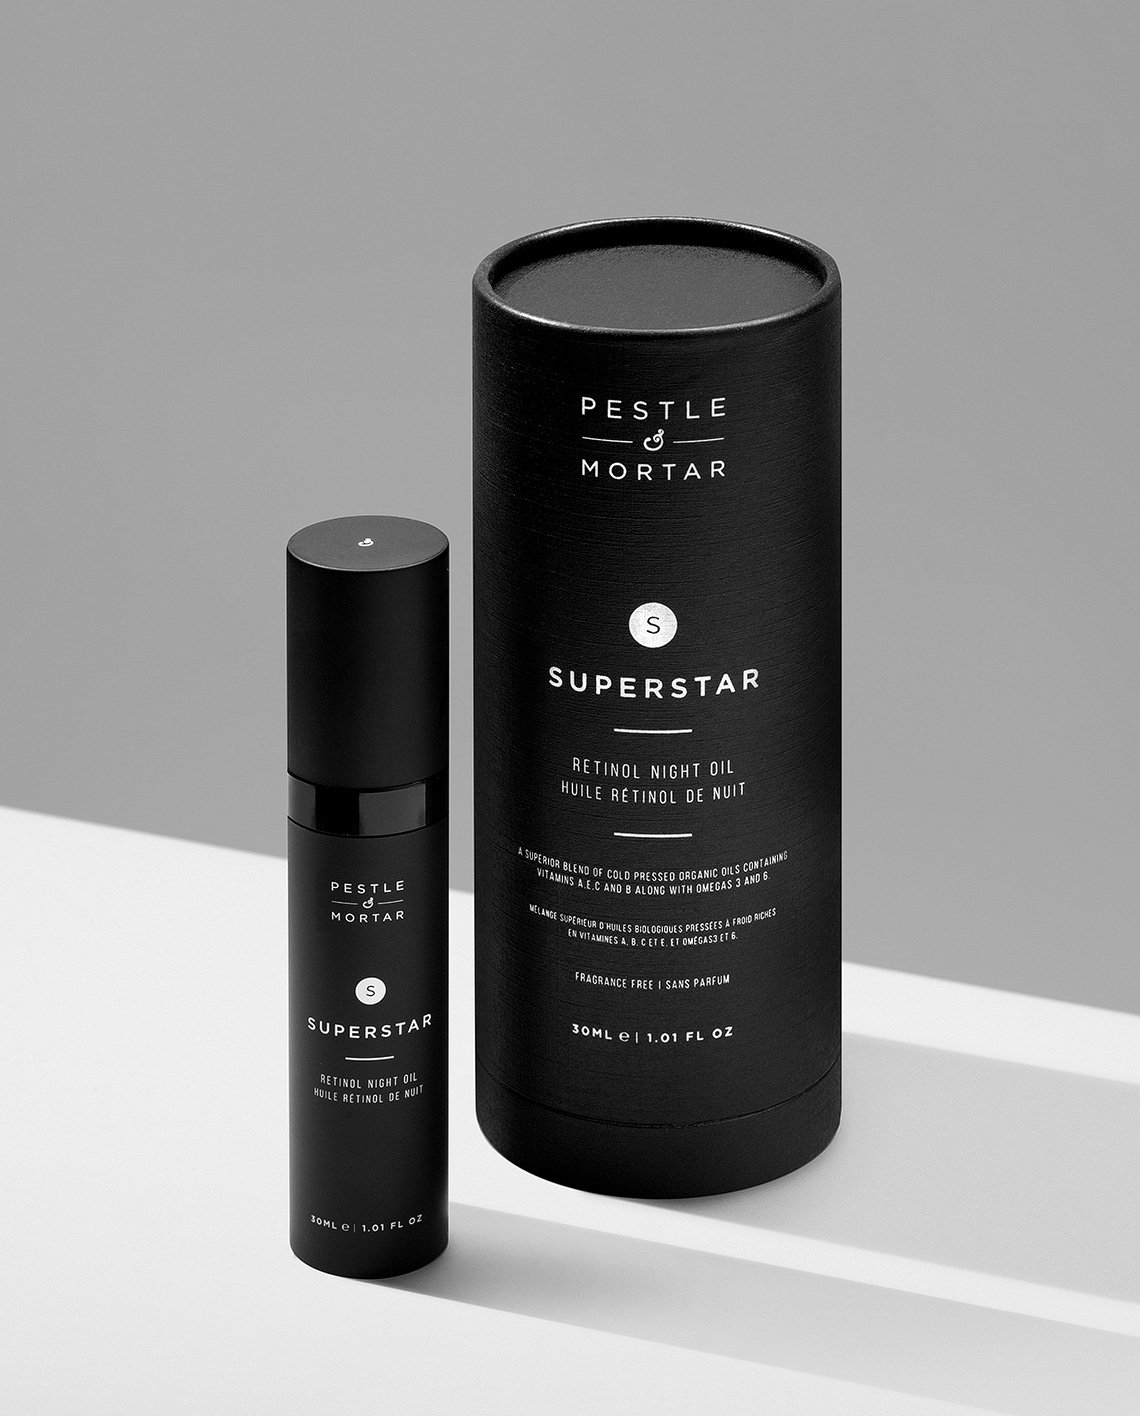 Pestle & Mortar Superstar Retinol Night Oil 30ml by Pestle & Mortar (Image #1)